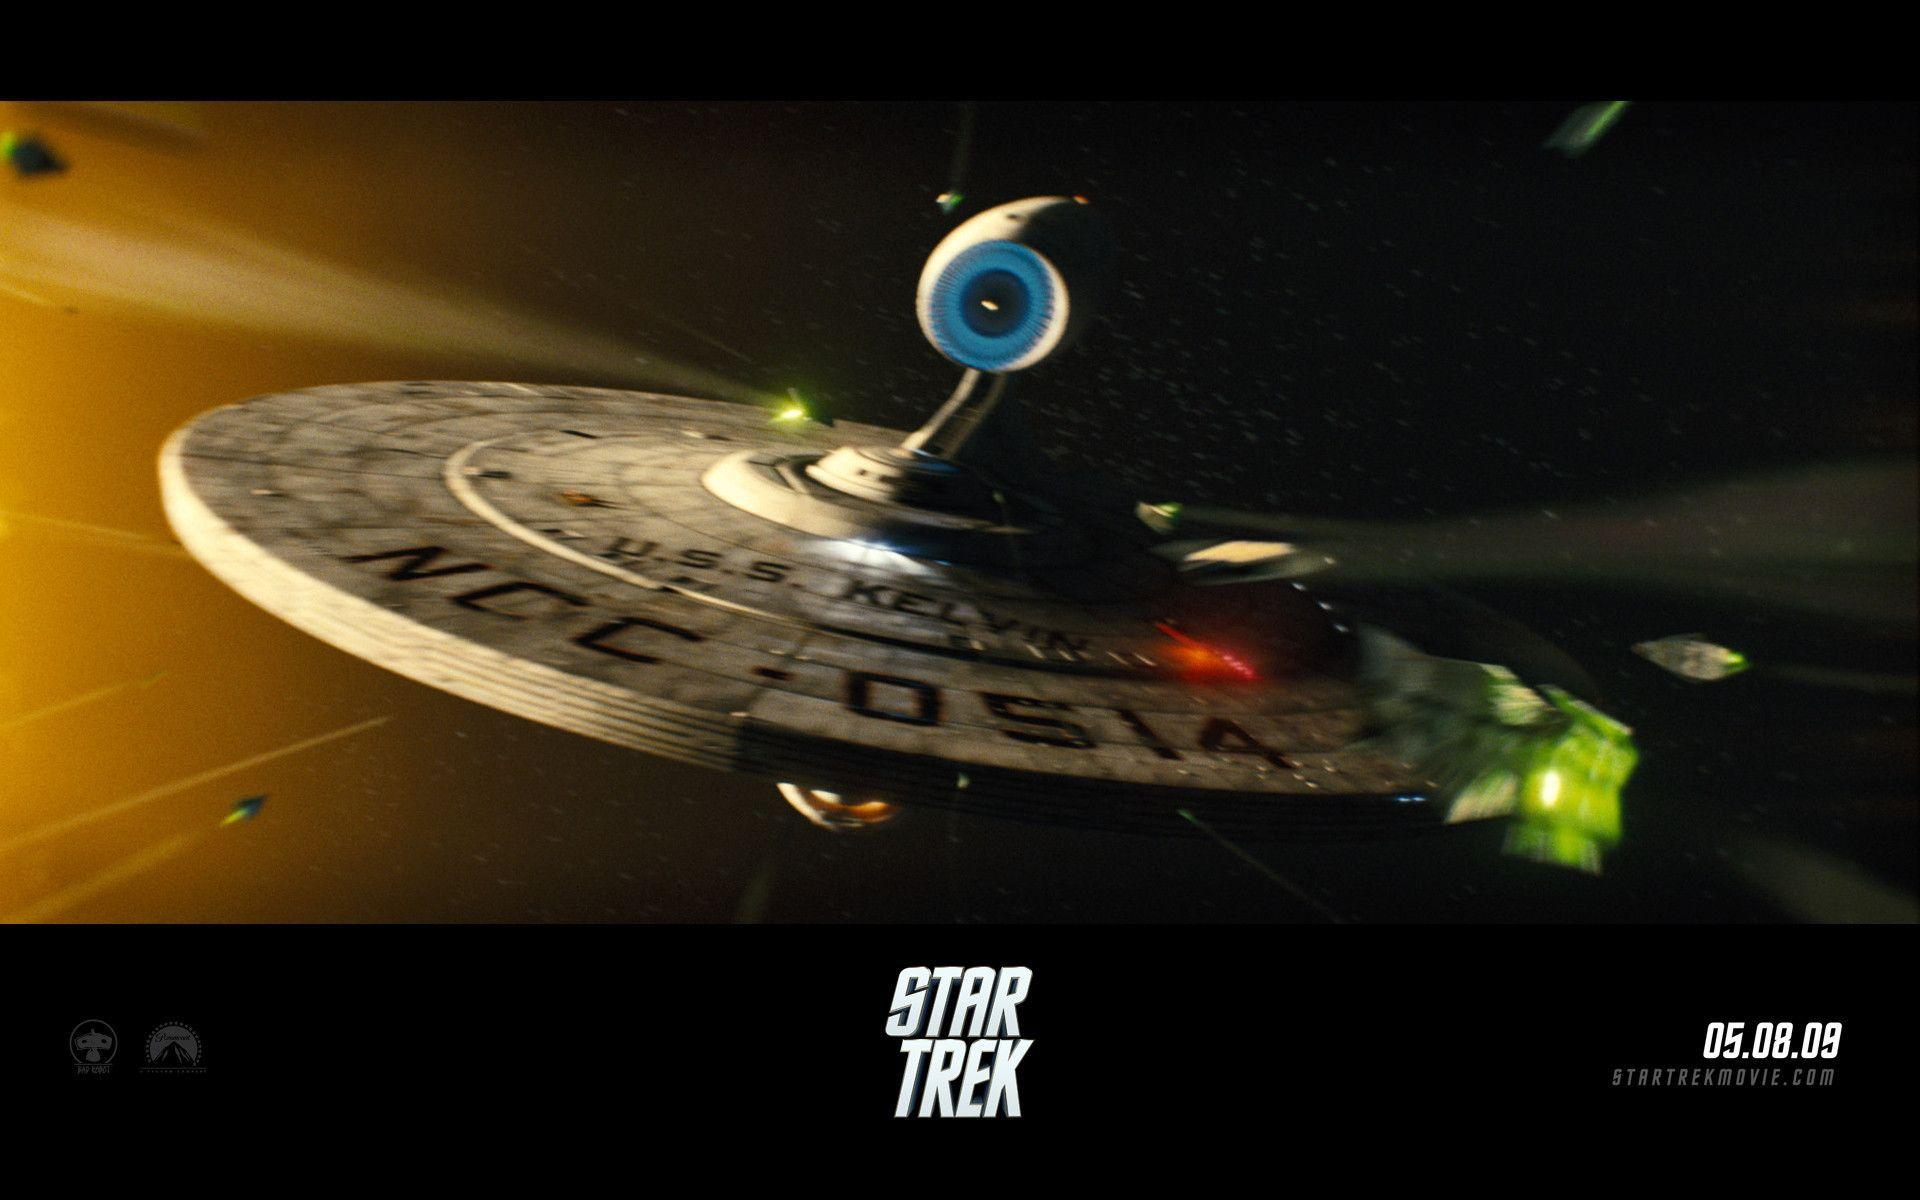 Star Trek Ships Wallpapers 1920x1200